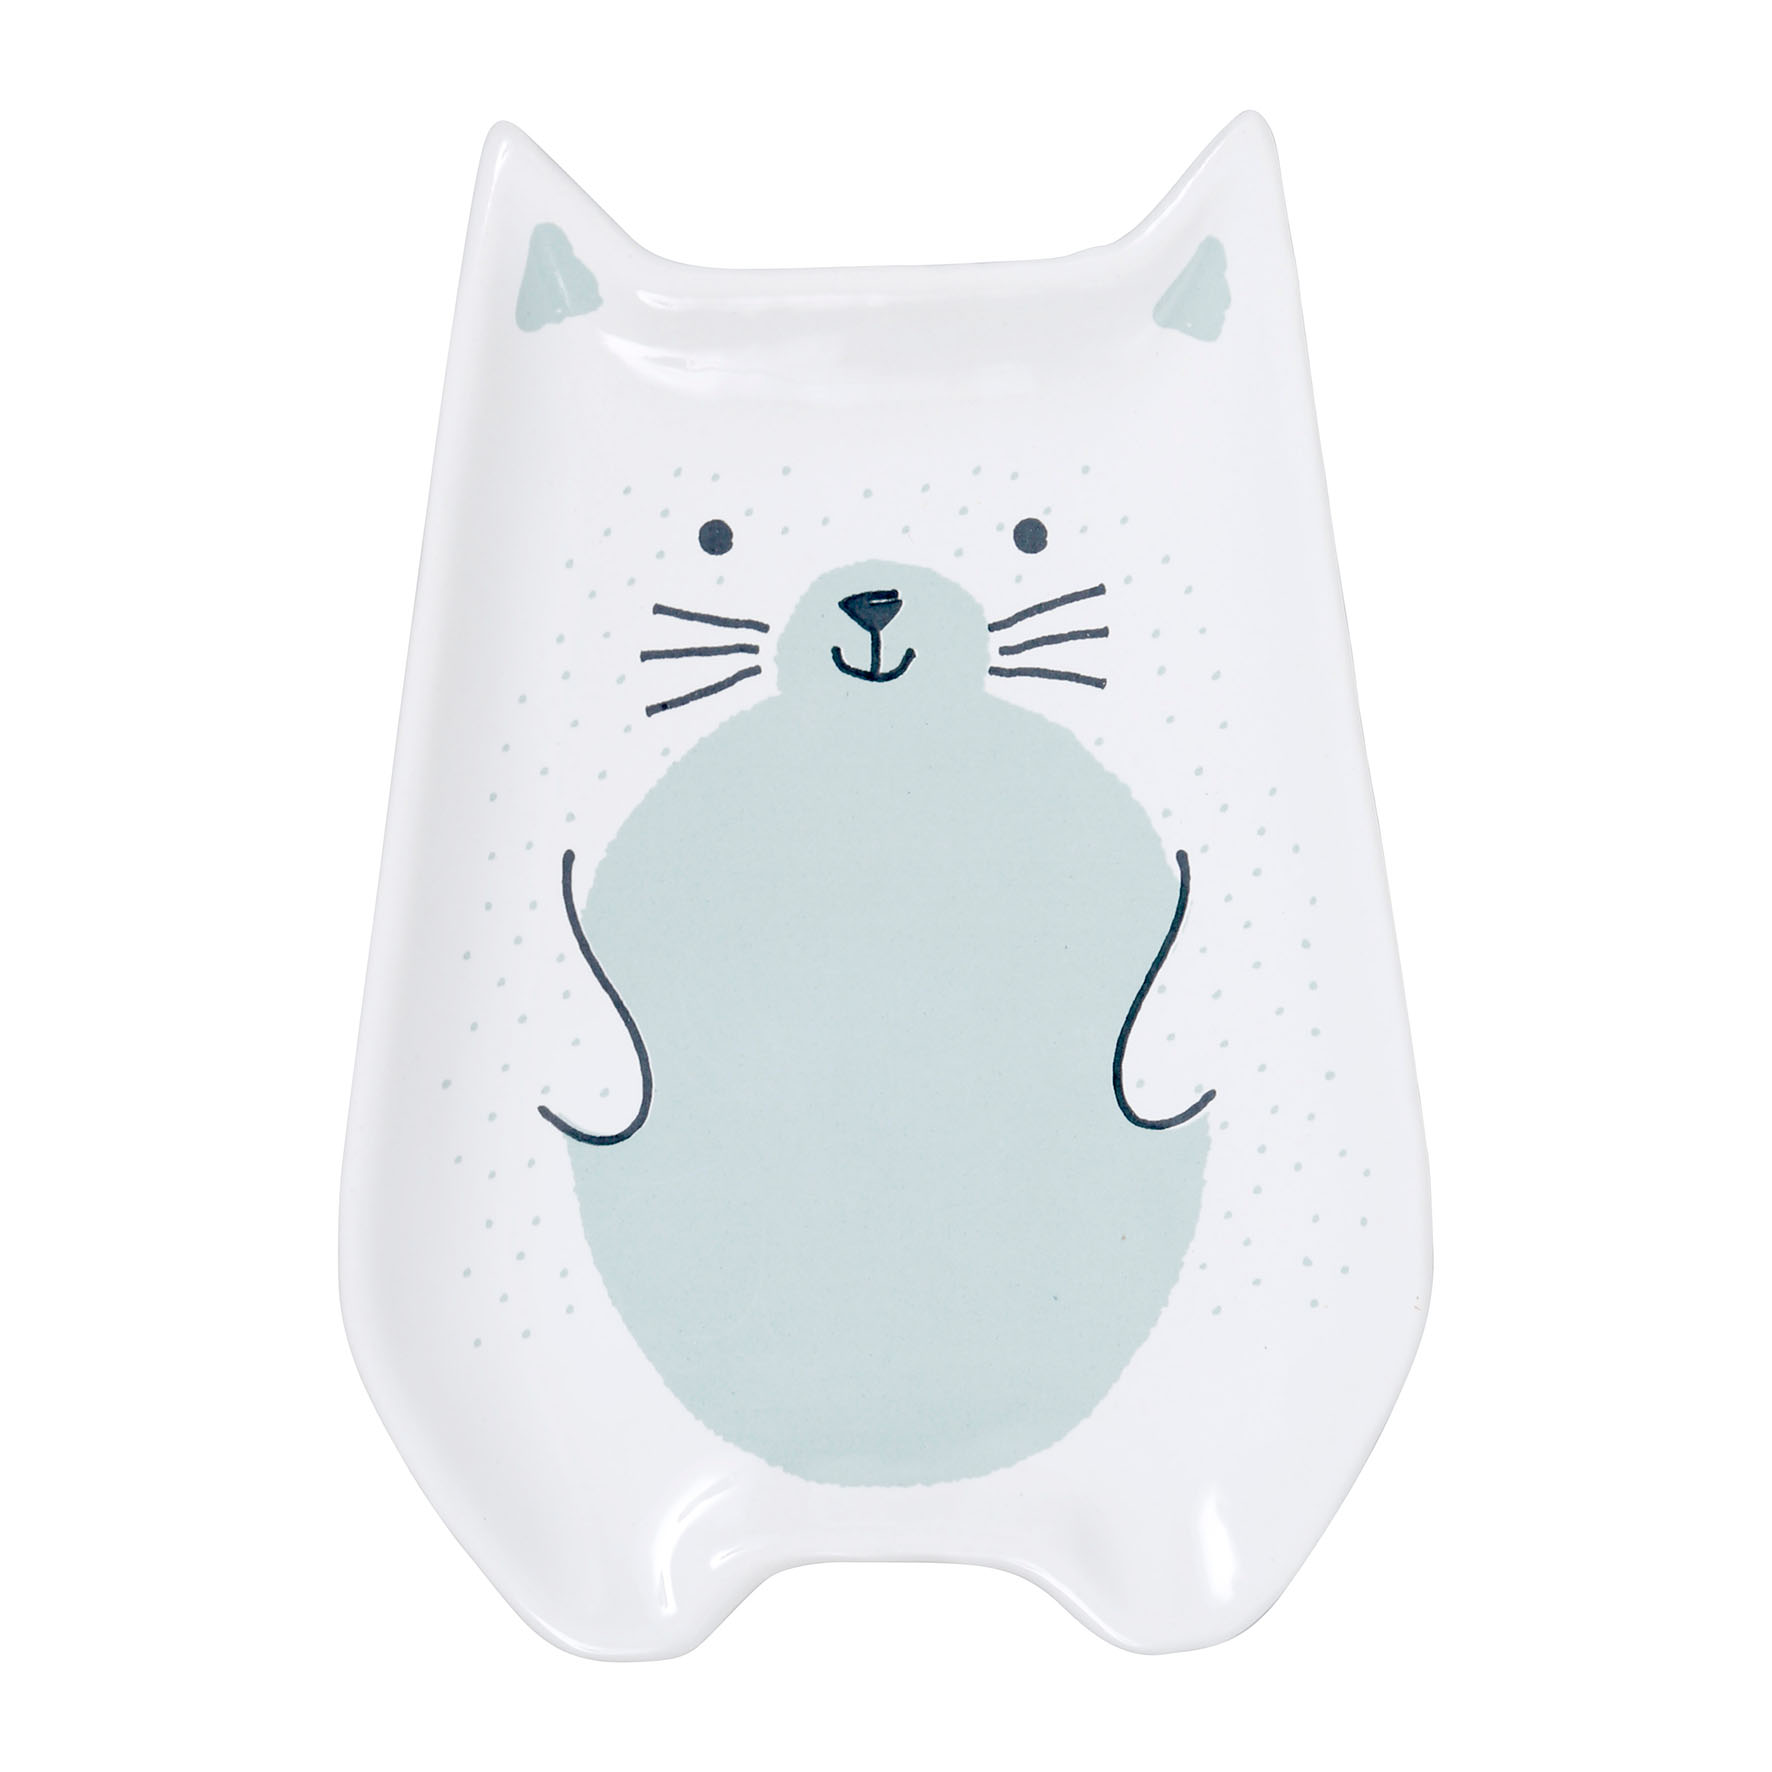 Farfurie in forma de pisica - Chaton Blanc thumbnail